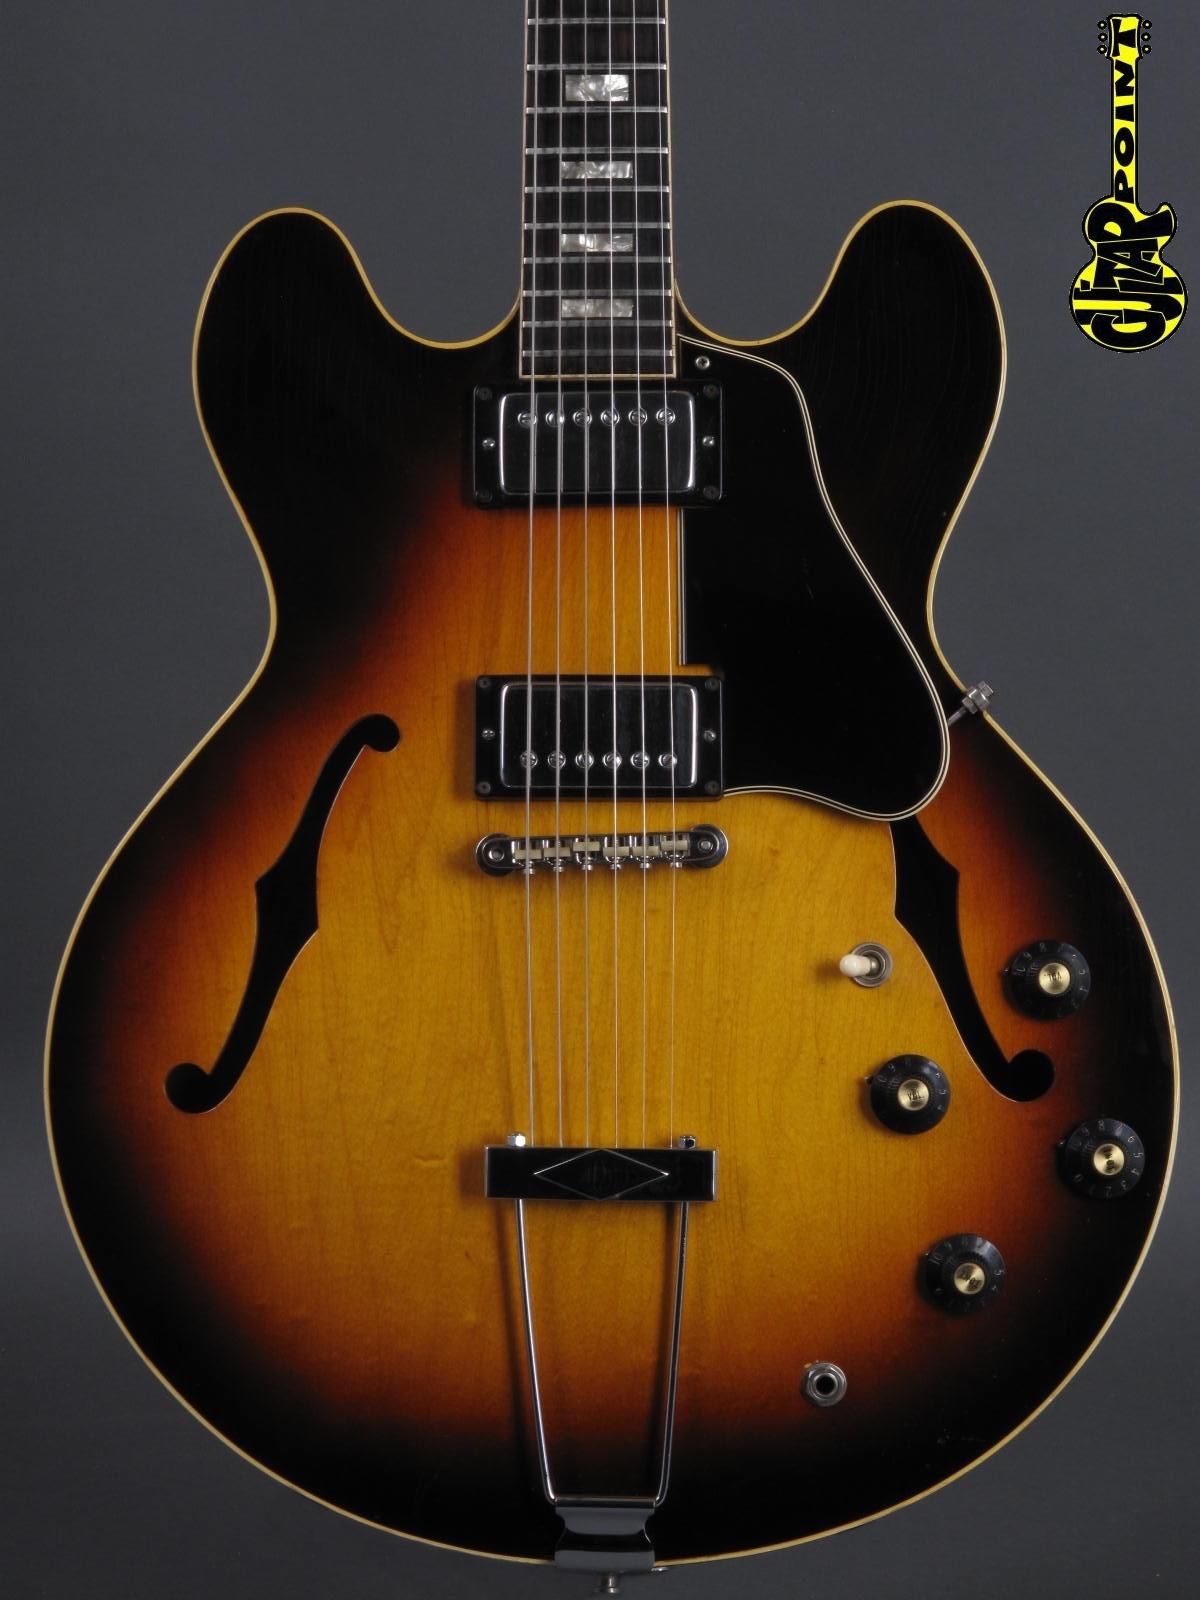 1968 Gibson ES-335 TD -  Sunburst incl. orig.hardshell case